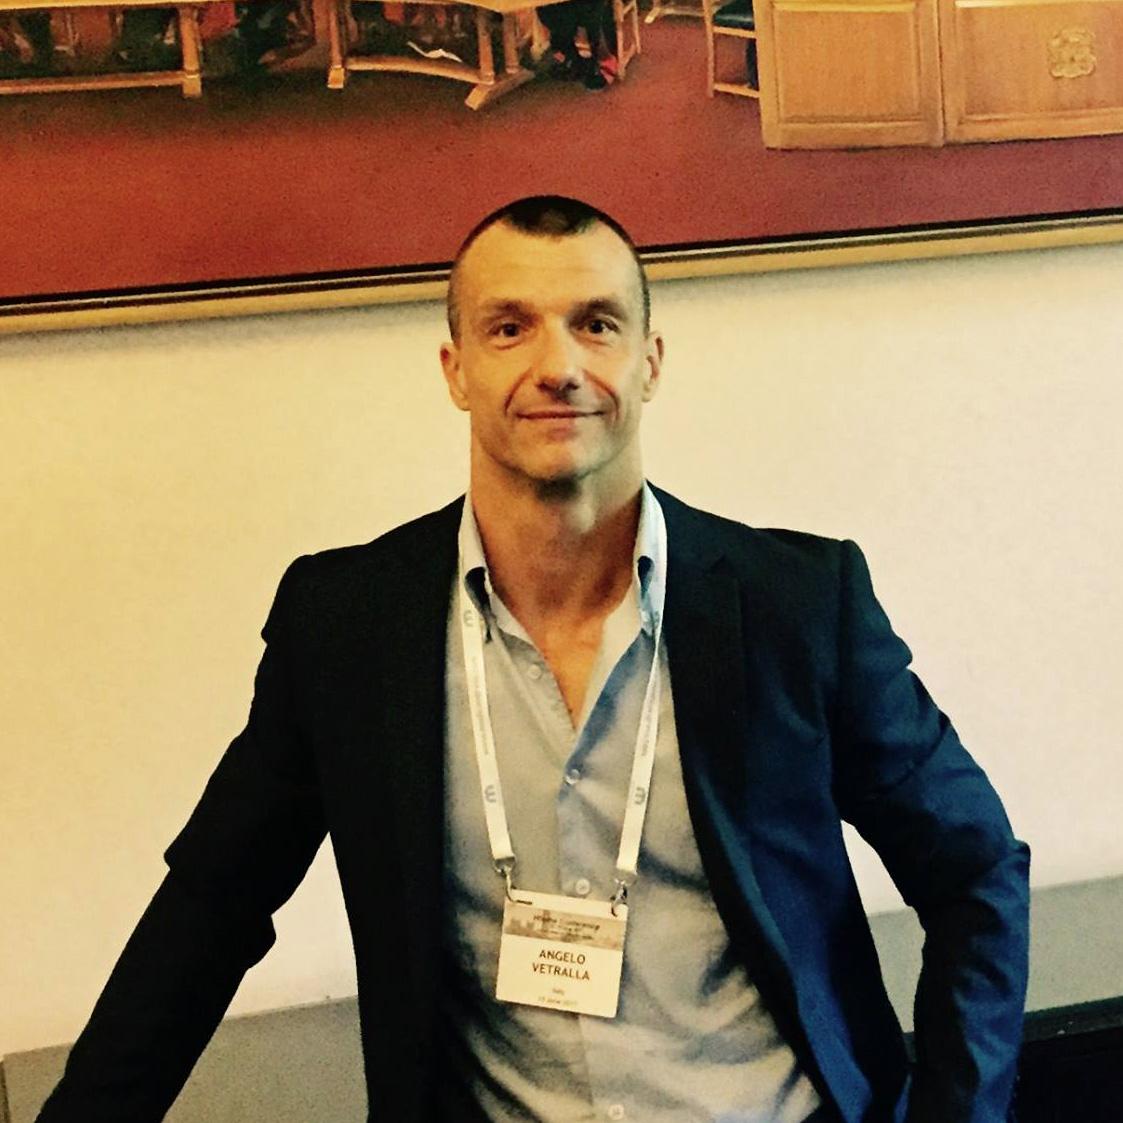 Angelo Vetralla - Master Osteopatia Sportiva